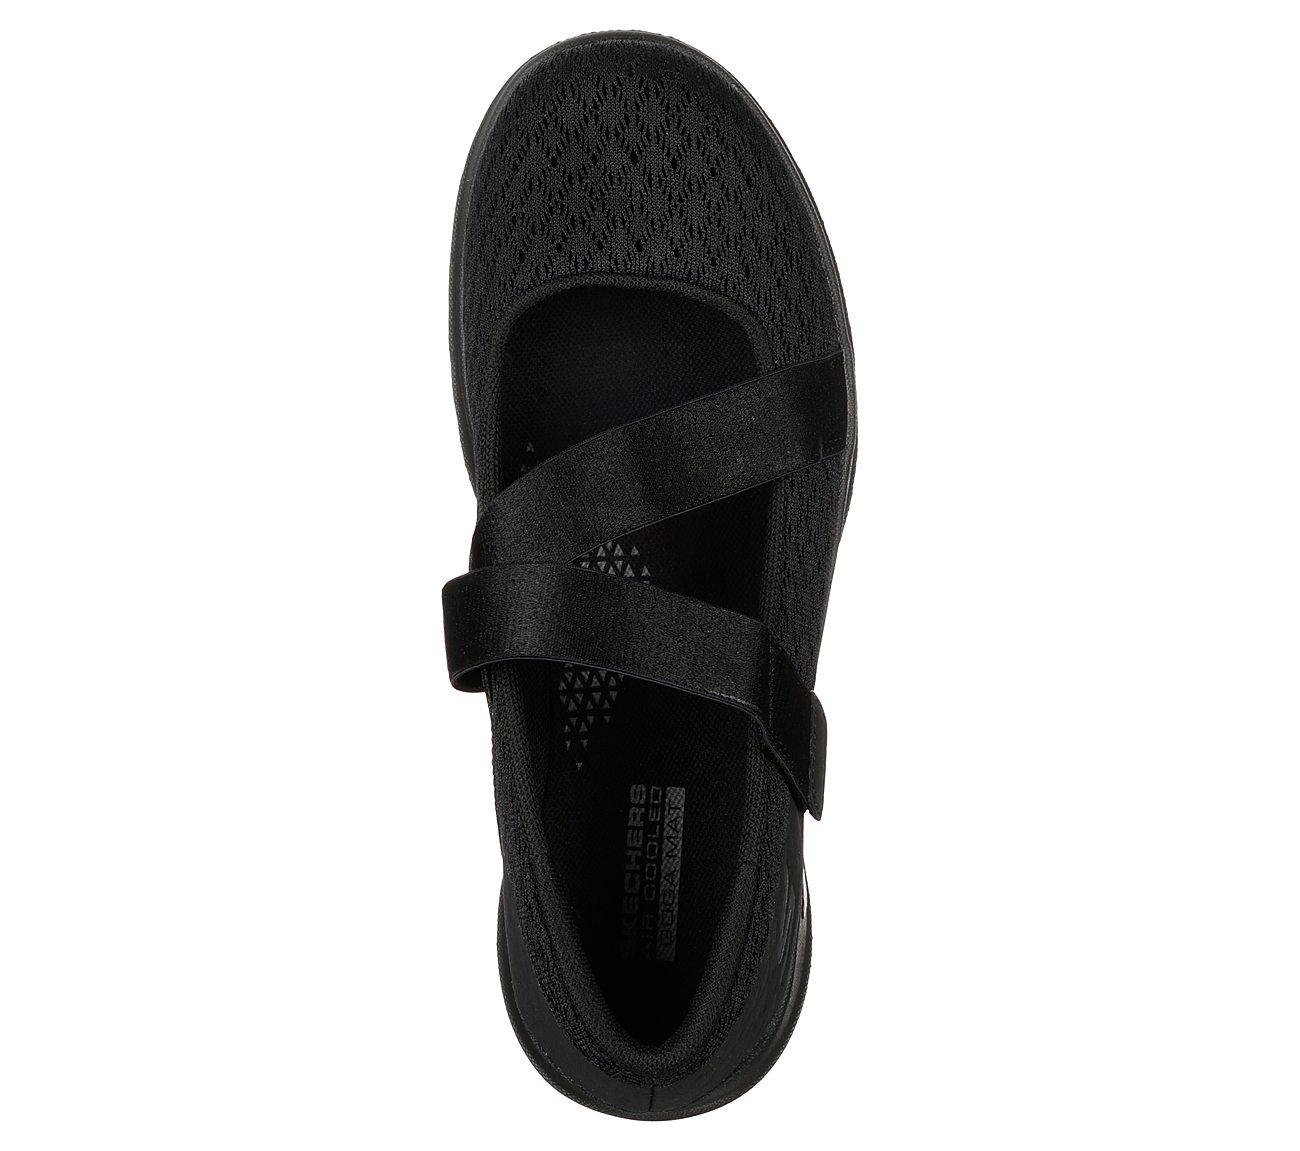 Skechers Go Walk Lite Divine Black Flat Comfort Shoes